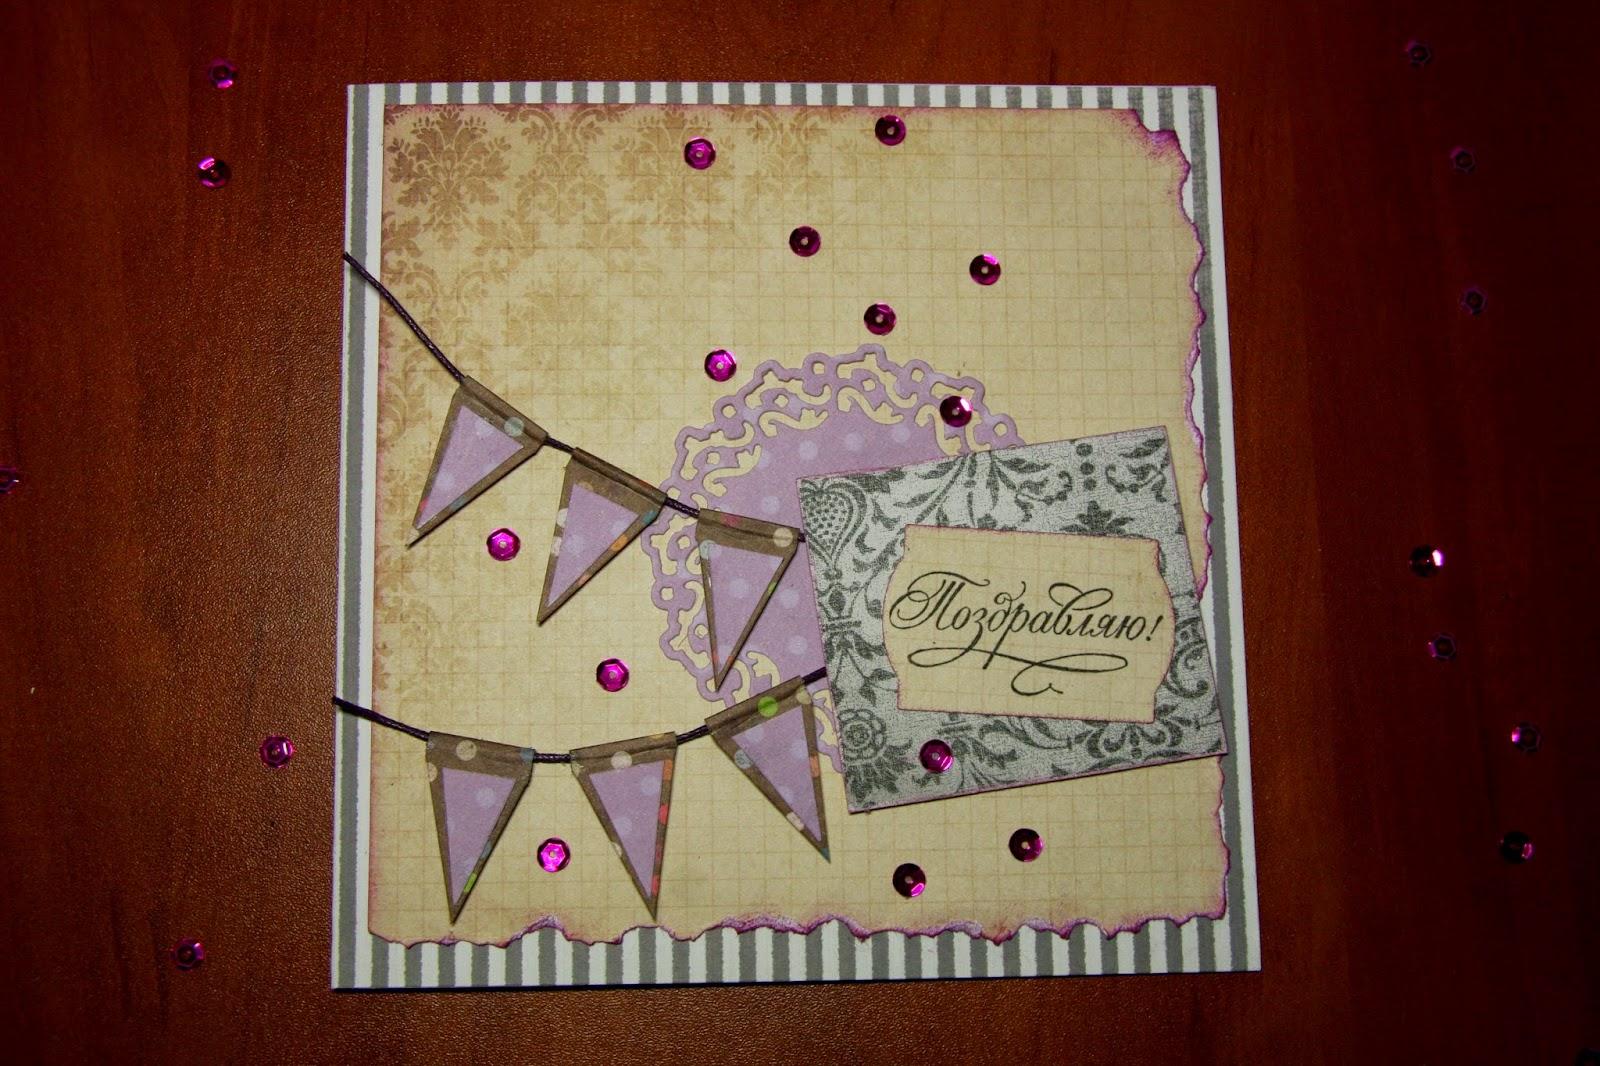 card scrapbooking cardmaking hamster-sensey открытка скрапбукинг